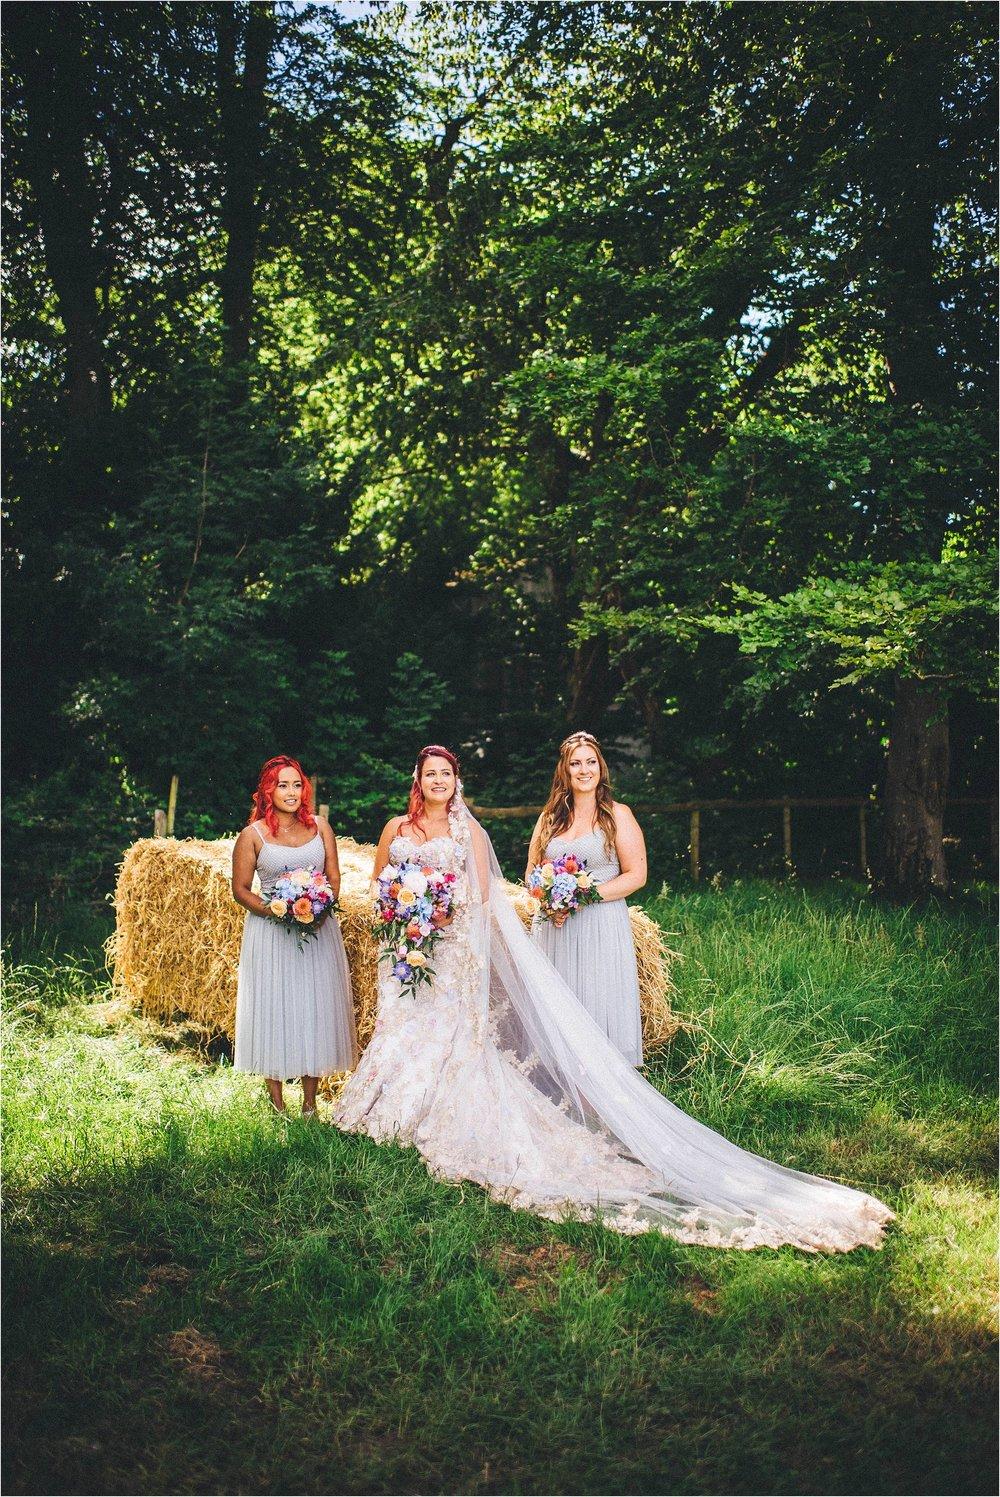 Milton Abbey Dorset Wedding Photographer_0124.jpg